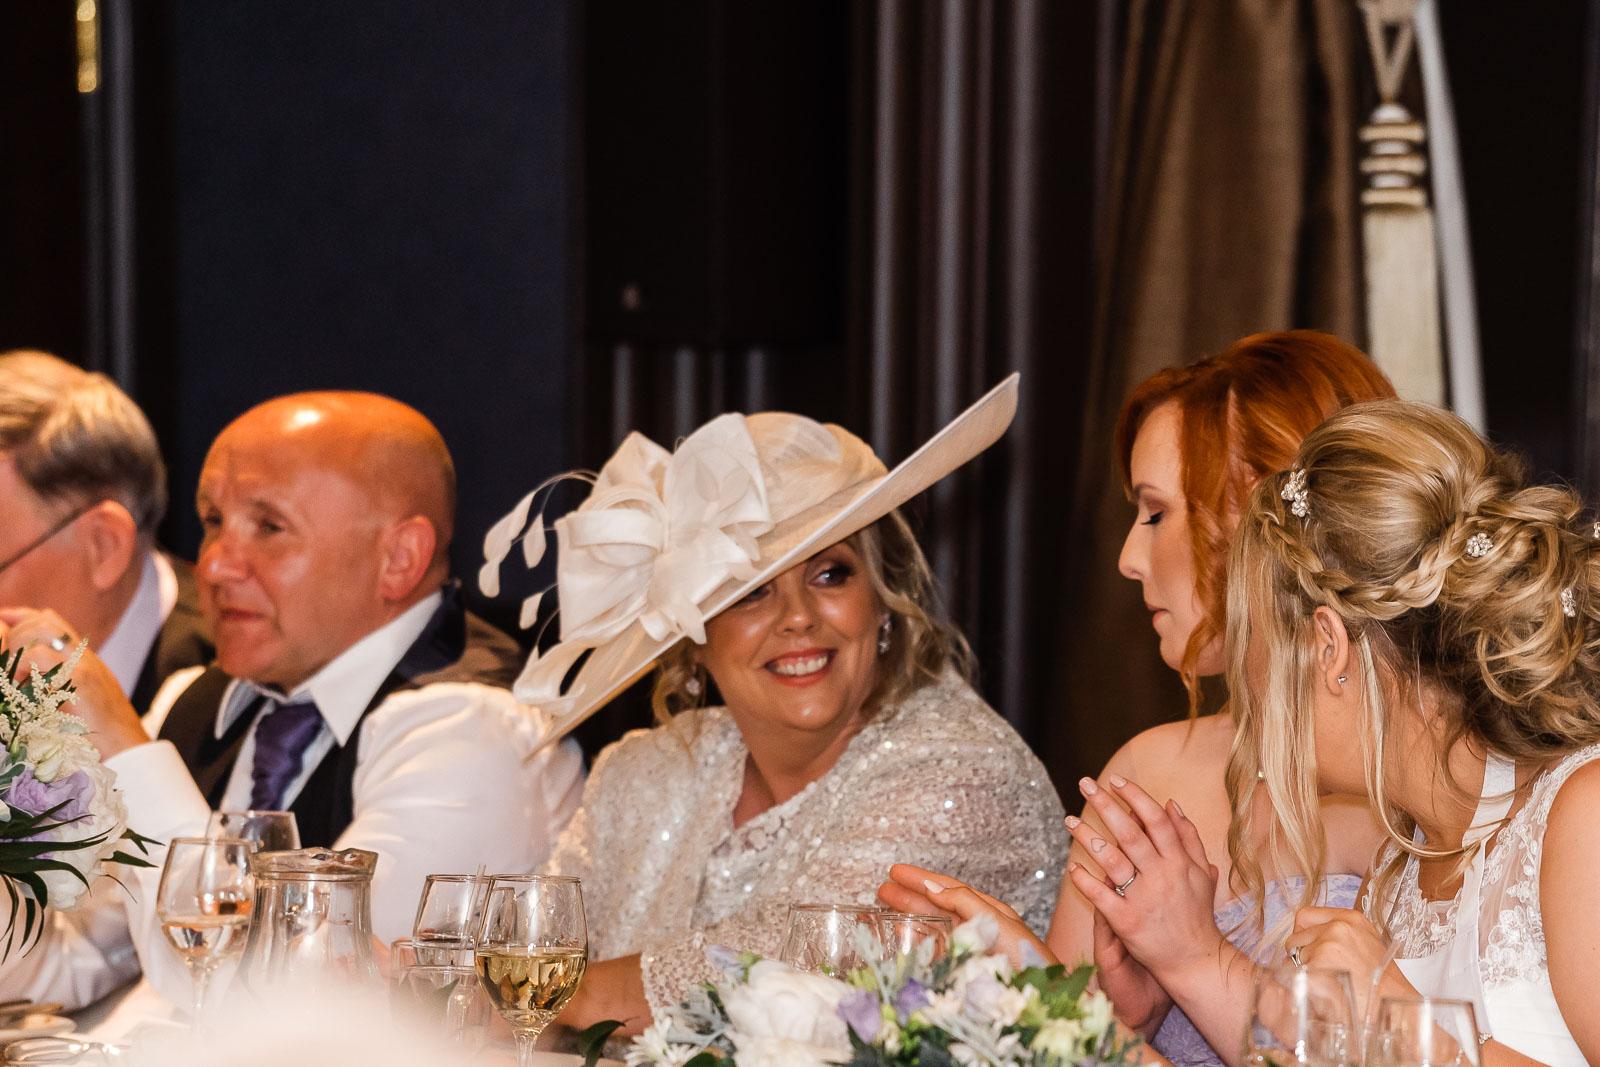 cornhill_castle_wedding_biggar_dearlyphotography (262 of 448).jpg